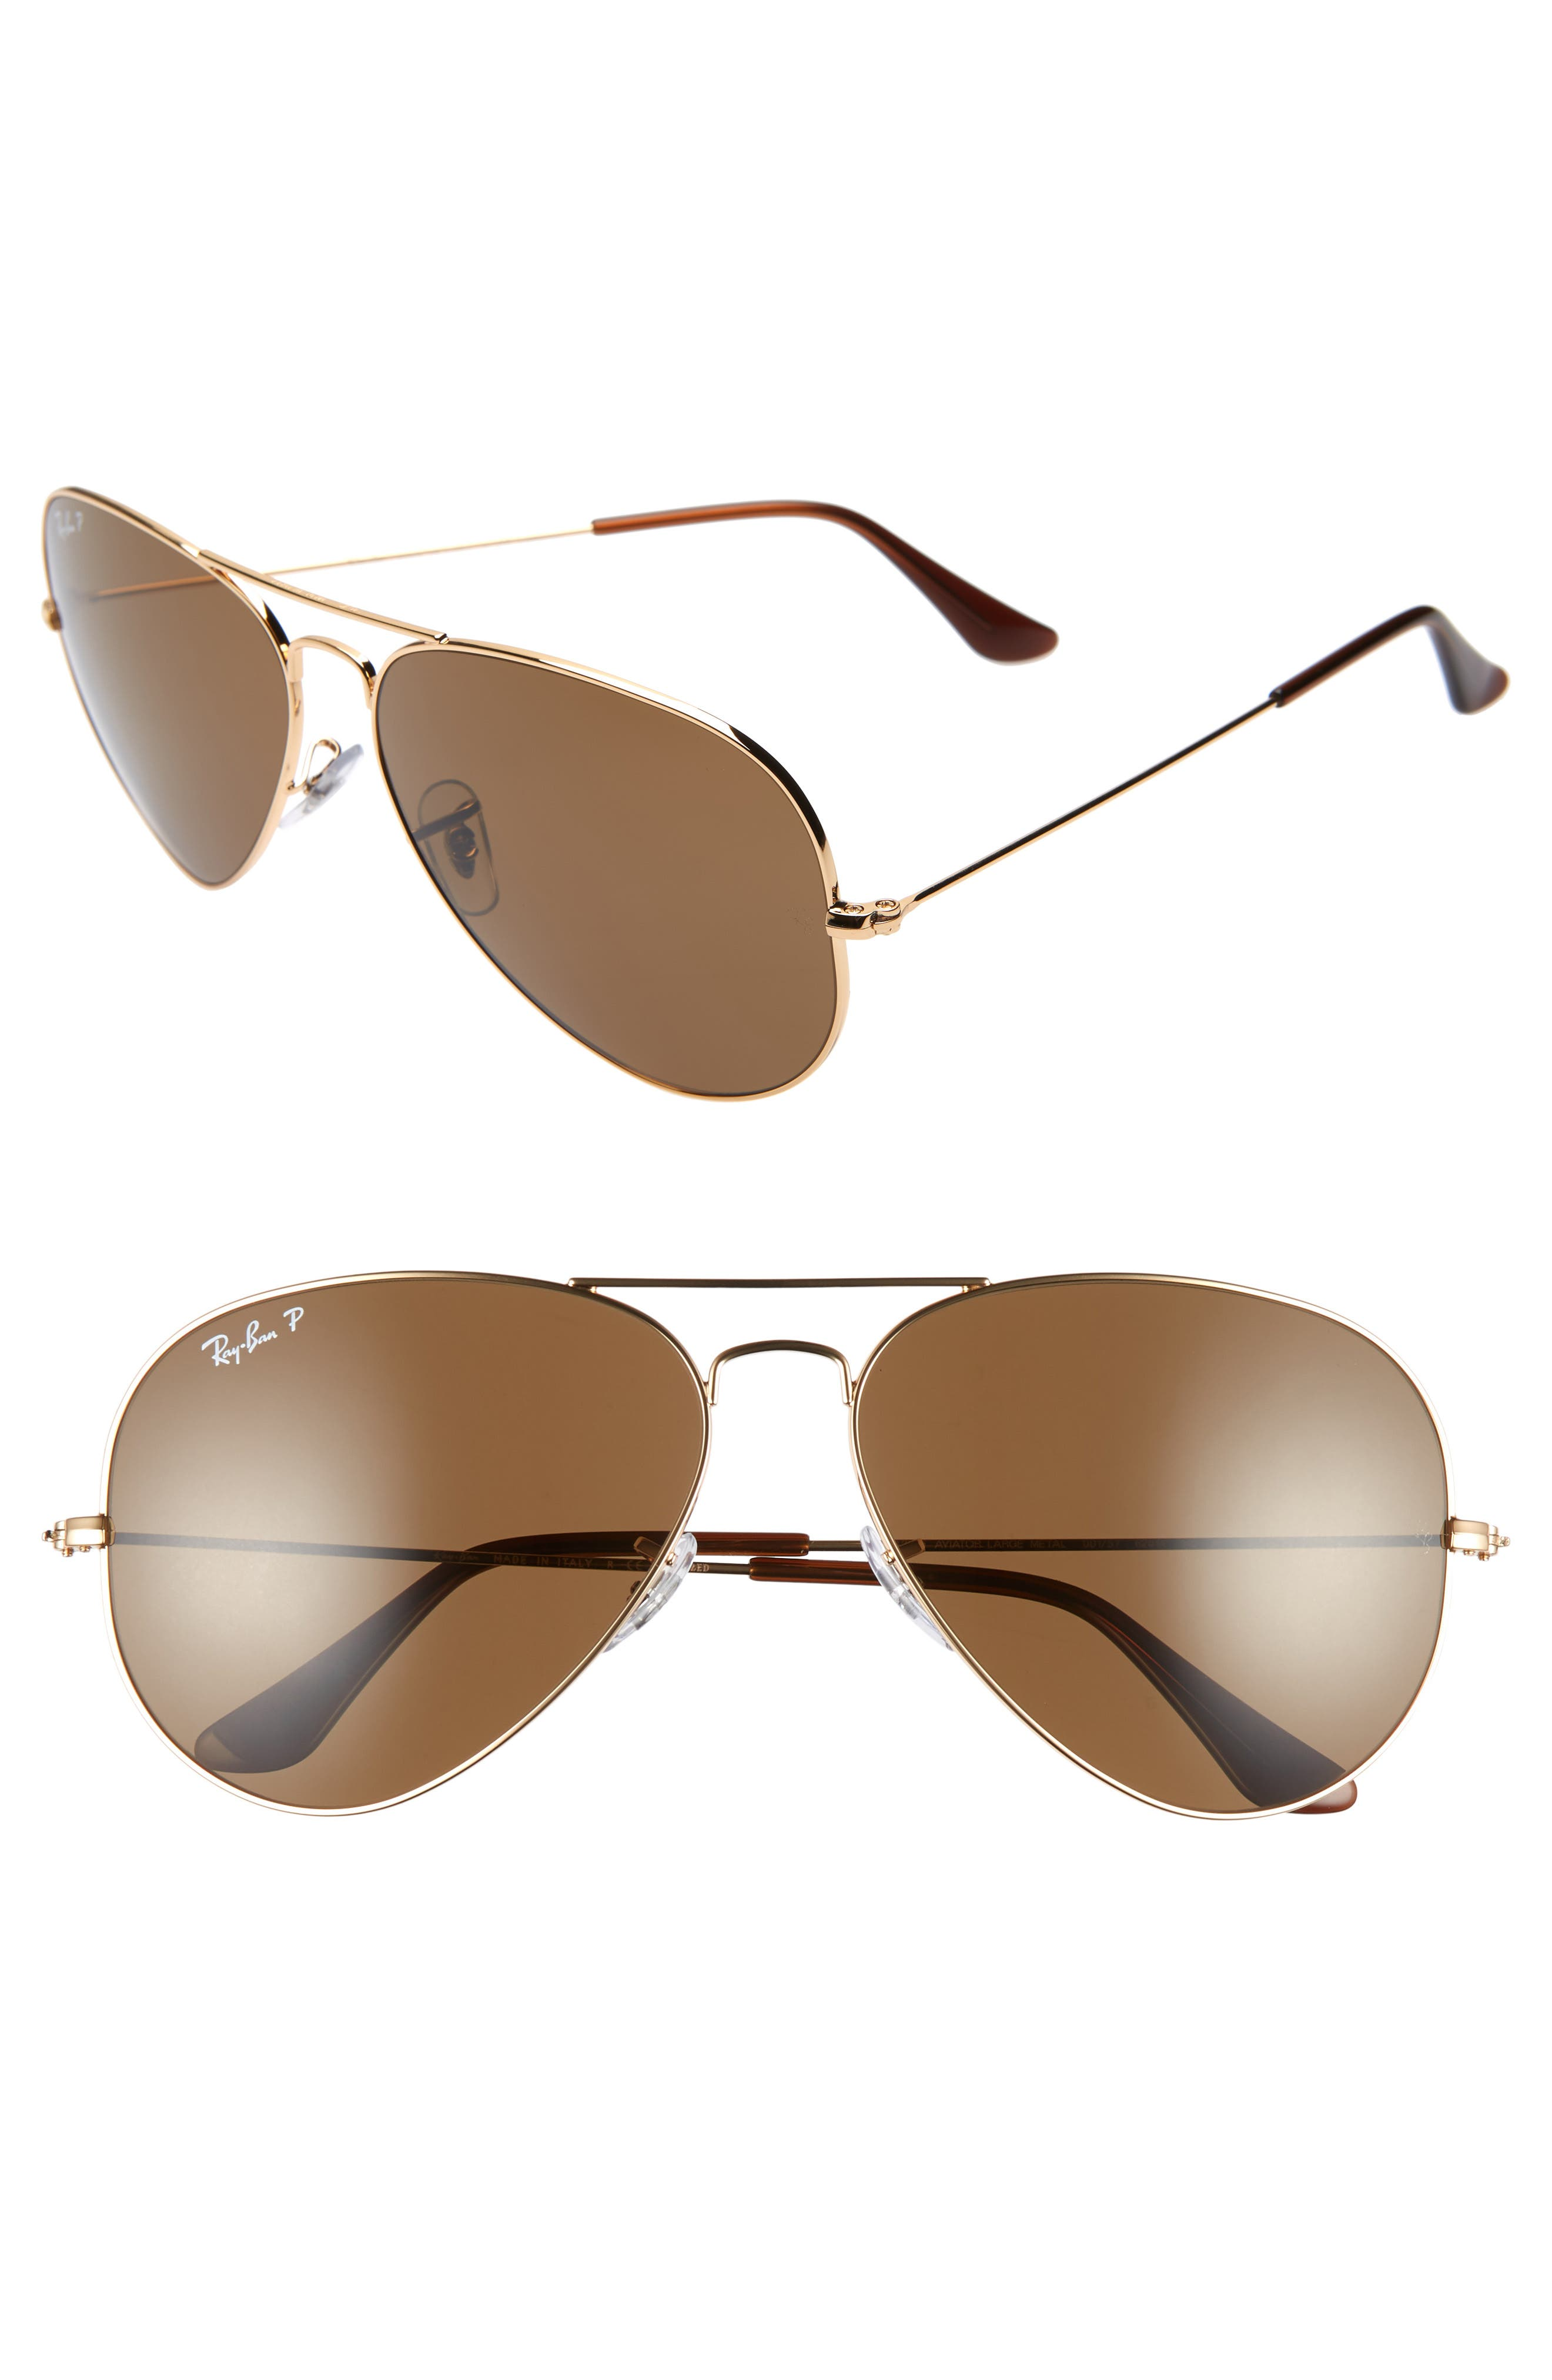 Original 62mm Oversize Polarized Aviator Sunglasses,                             Main thumbnail 1, color,                             710